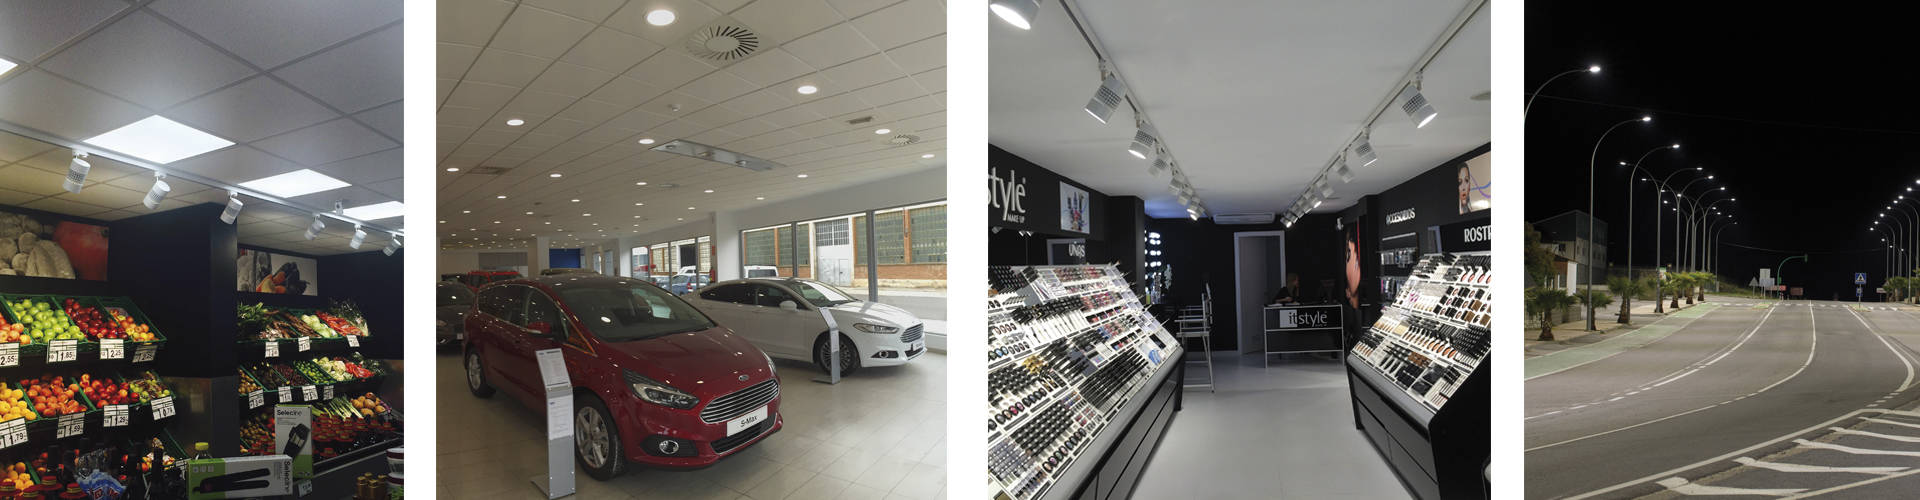 LEDS GO PROJECT Instalaciones y montajes Vallbona D'anoia Barcelona